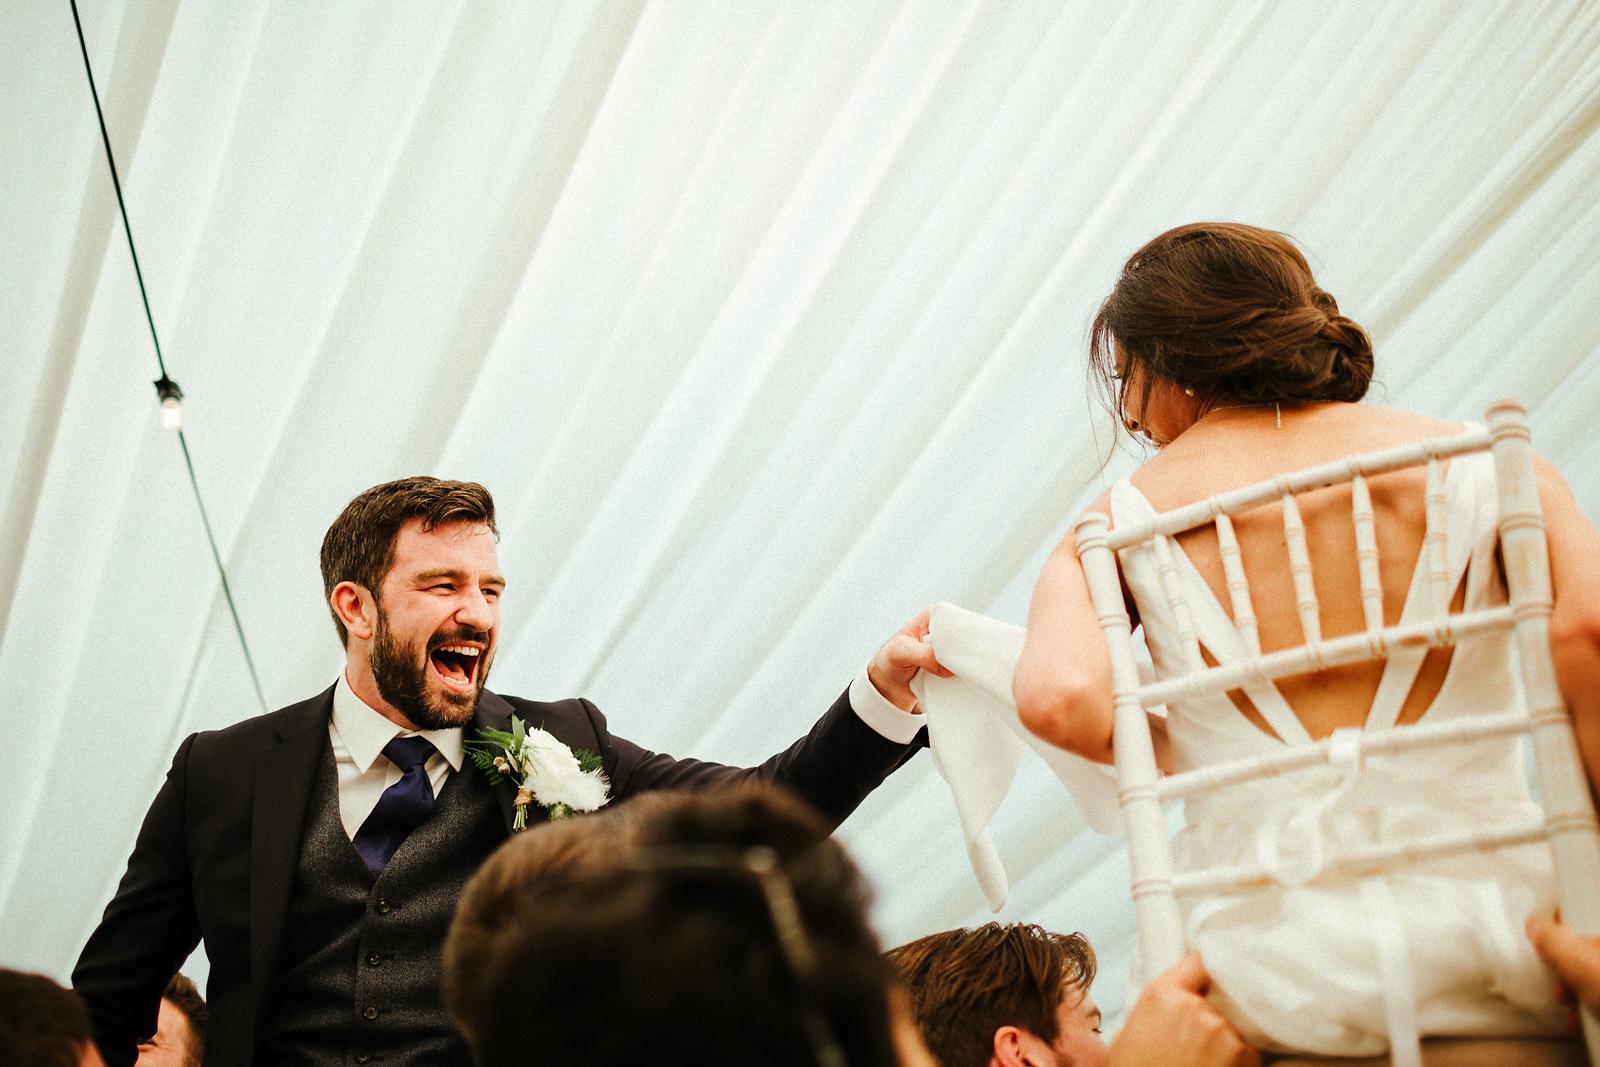 Jewish wedding first dance photo